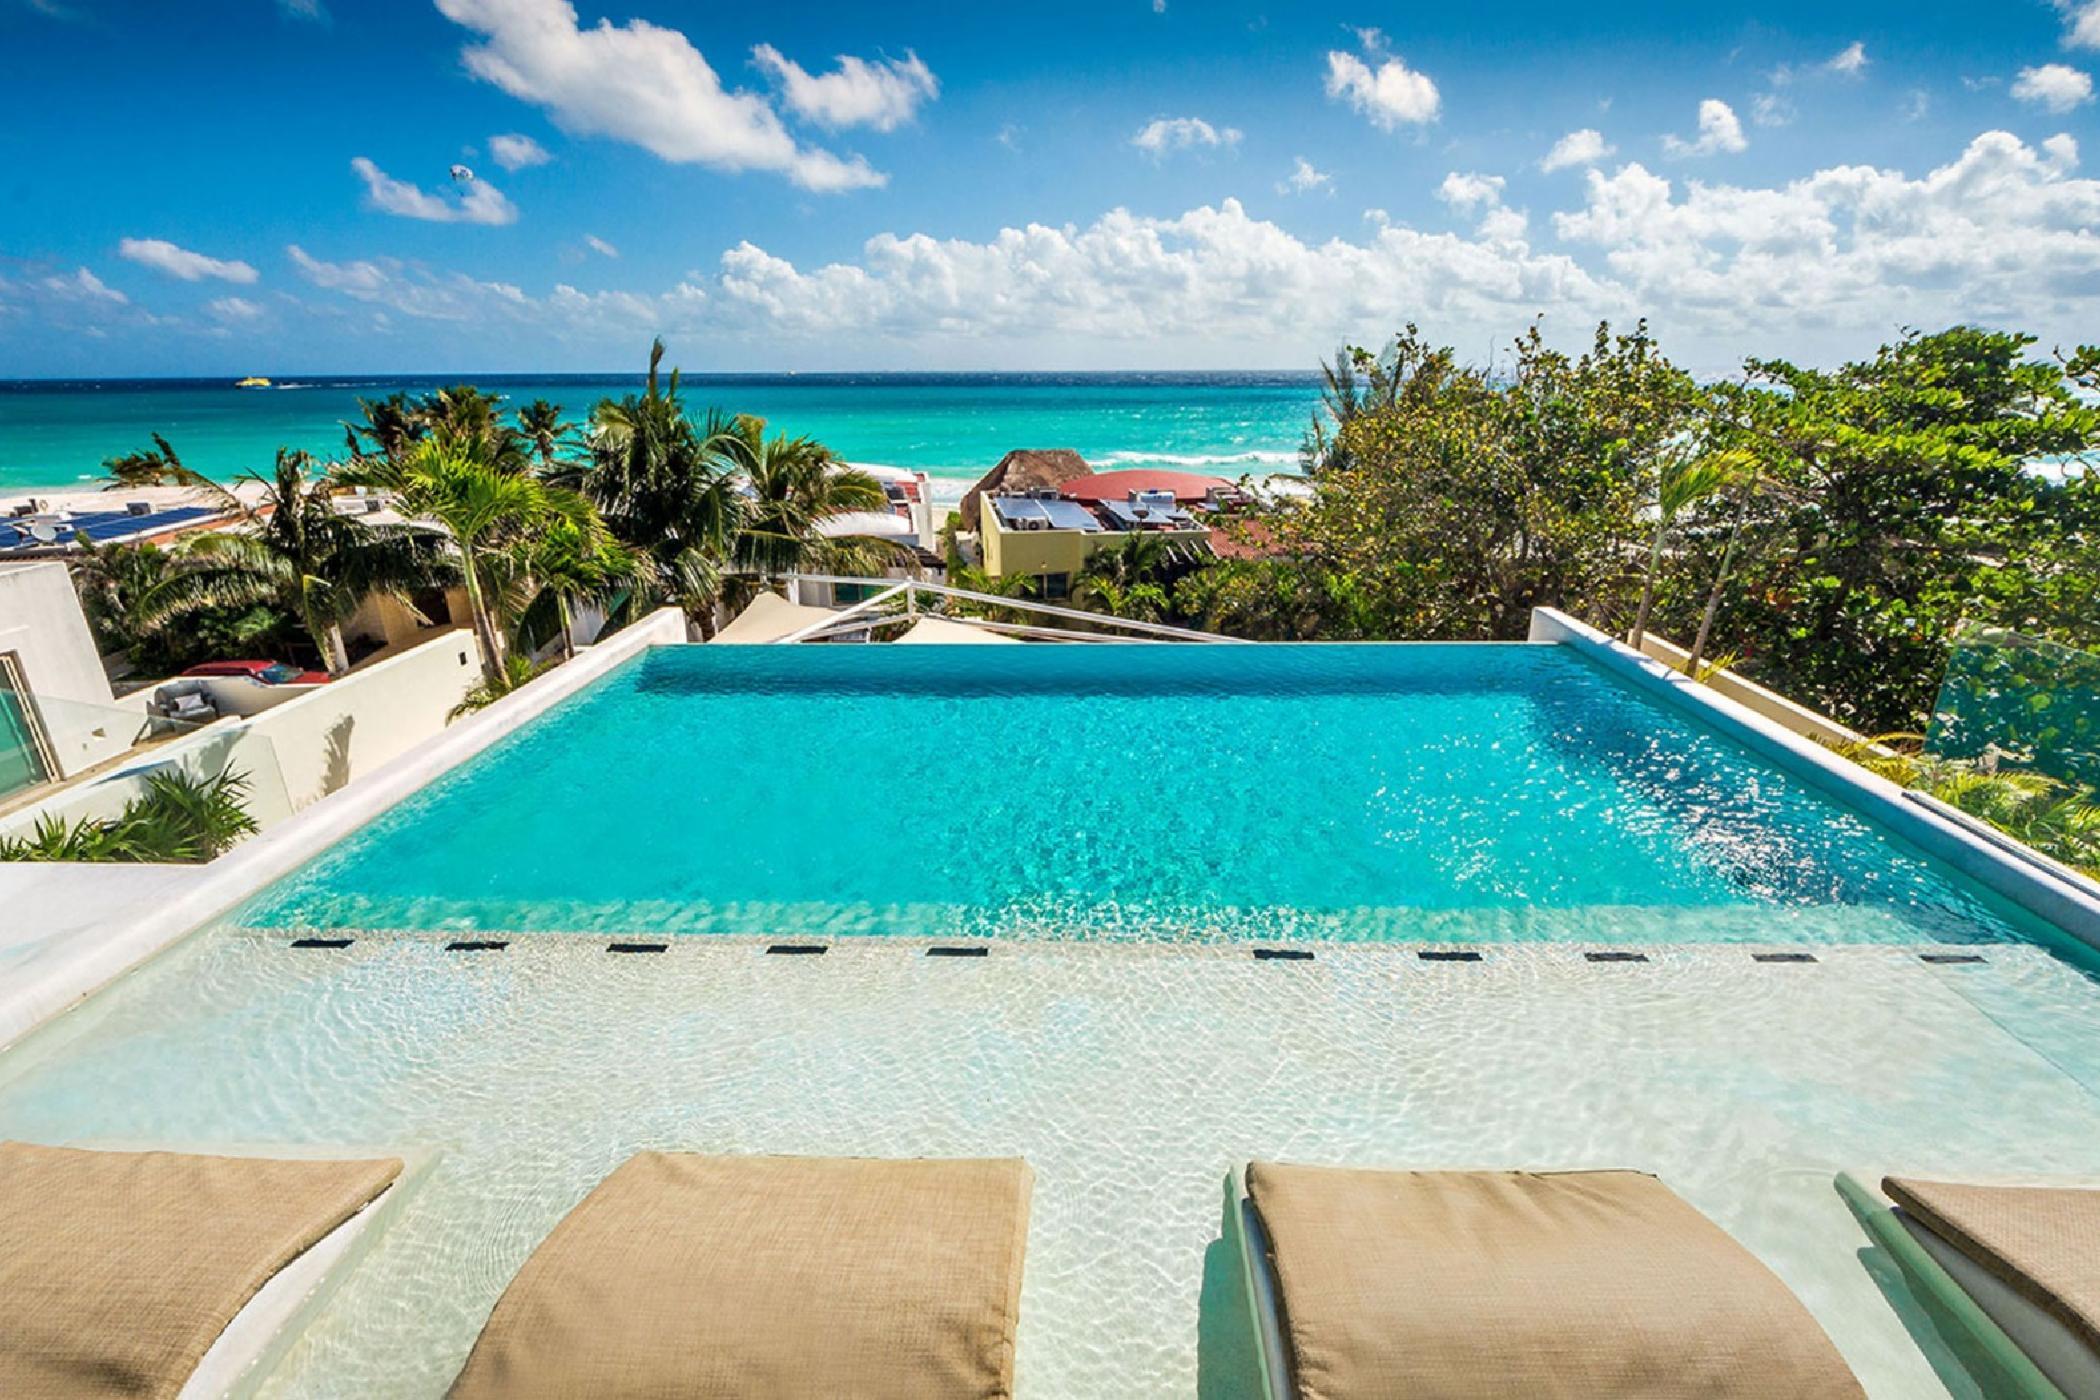 Maya_Luxe_Riviera_Maya_Luxury_Villas_Experiences_Vista_Hermosa_16.jpg